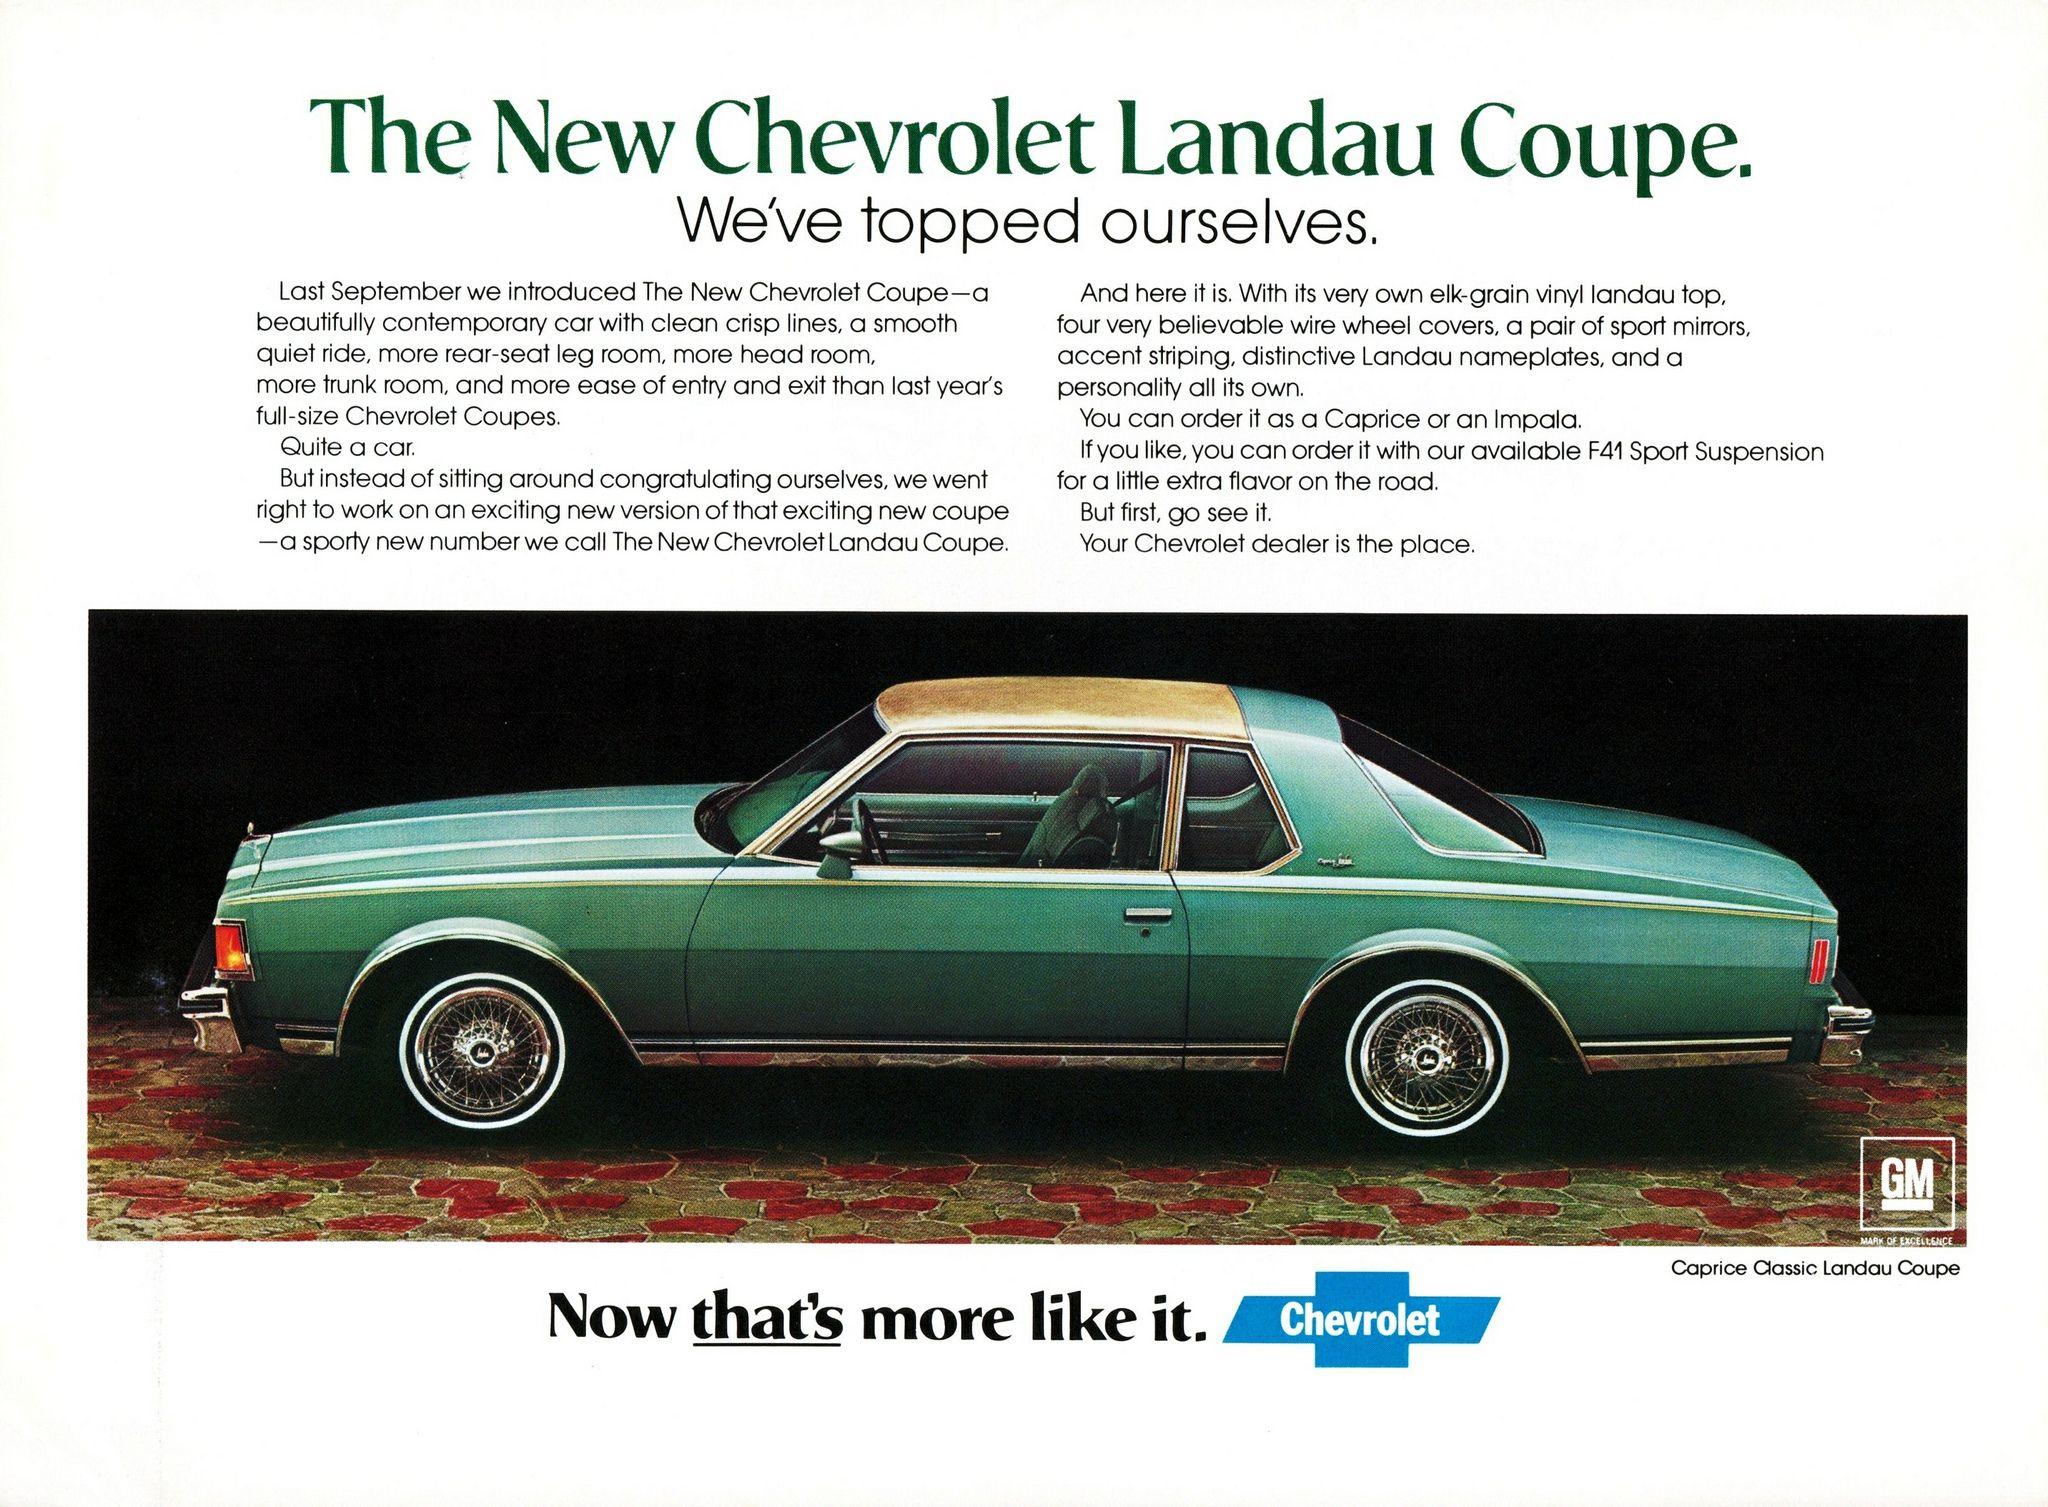 1980 chevrolet caprice classic landau coupe chevrolet 1979 1992 pinterest chevrolet caprice chevrolet and coupe